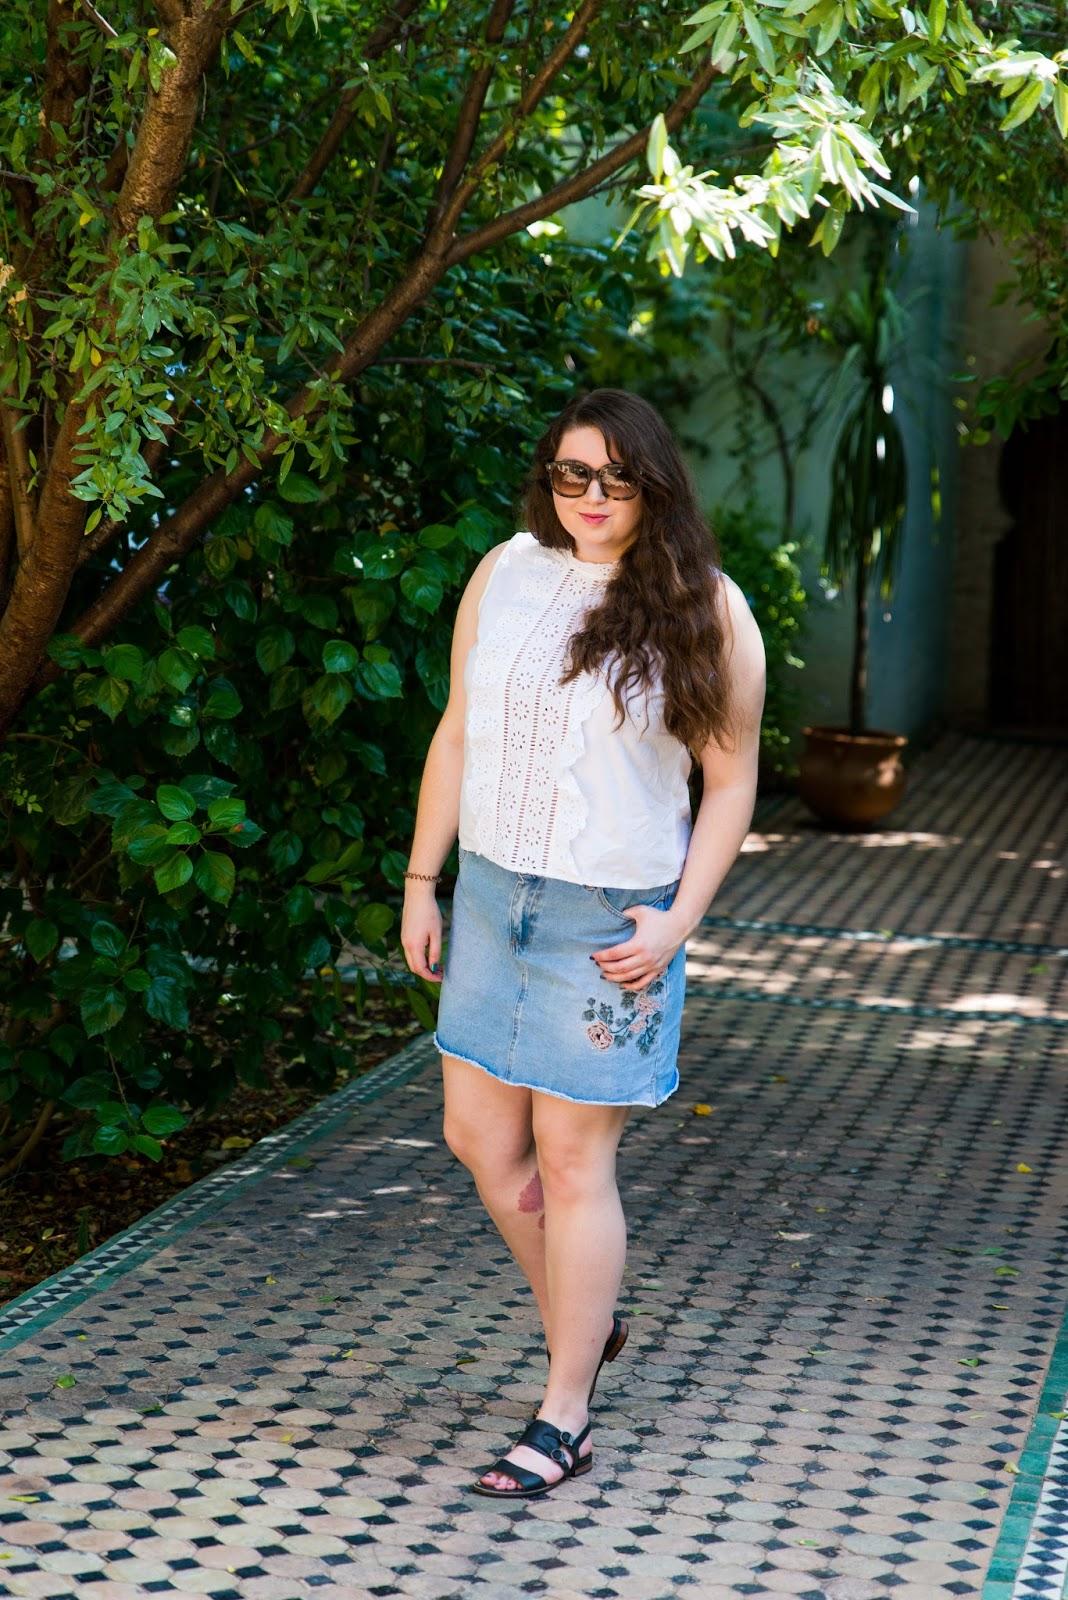 morocco fes fez ootd liquid grain liquidgrain blog blogger fashion